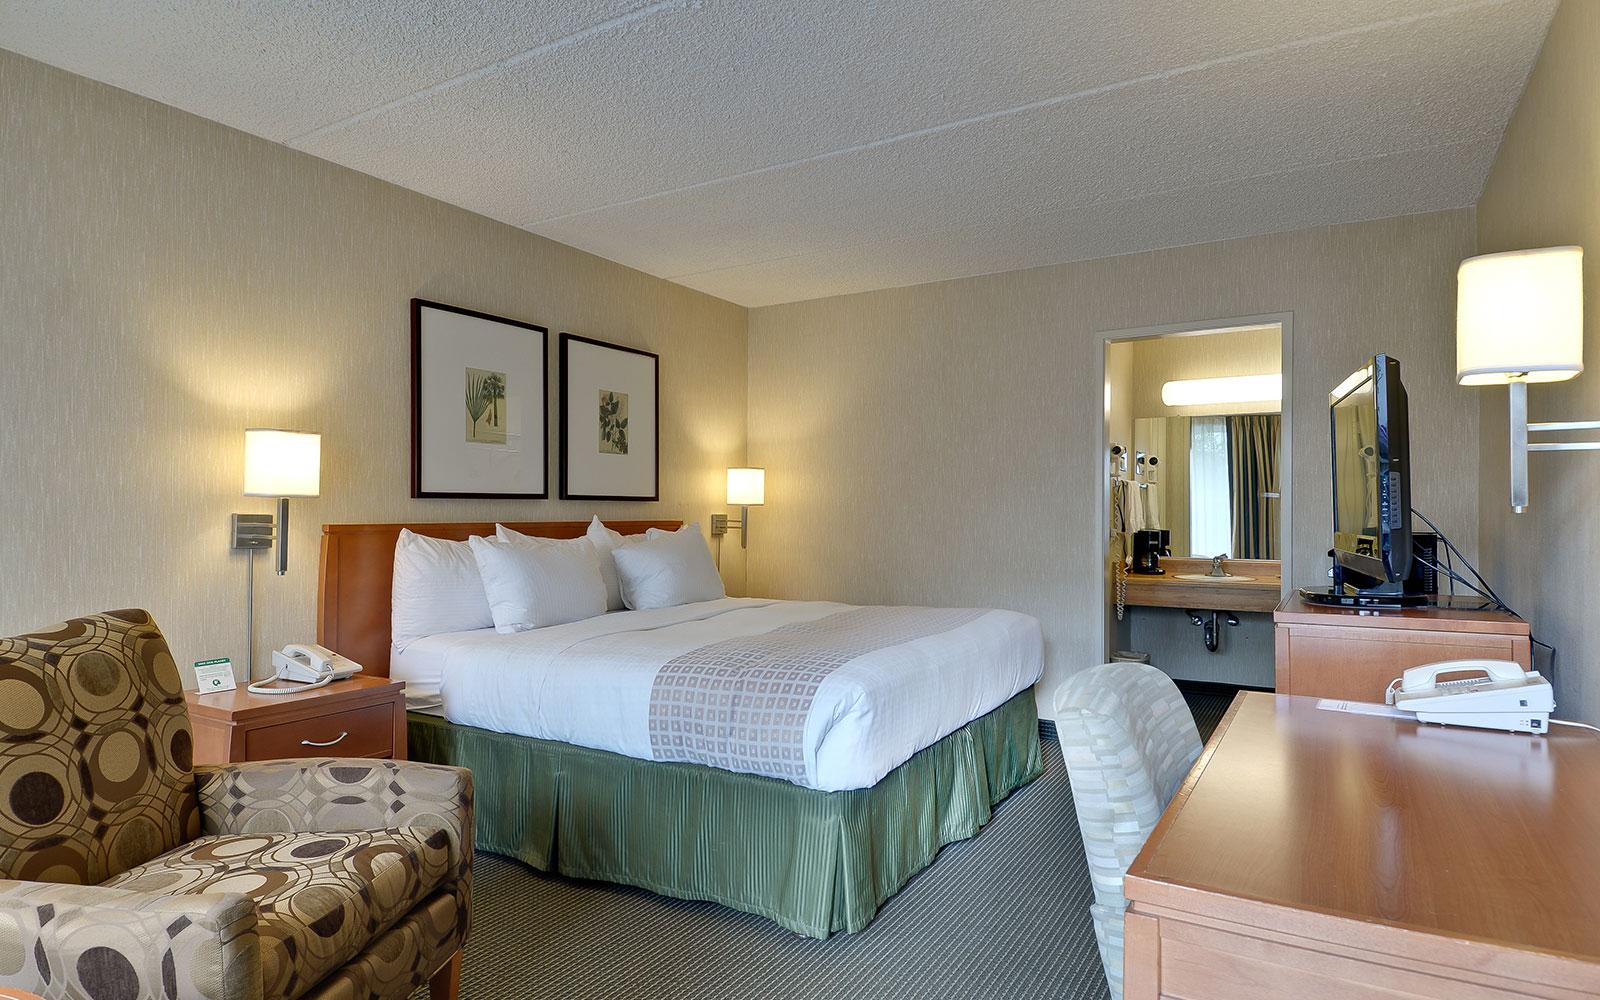 sacramento ca hotel accommodations vagabond inn sacramento